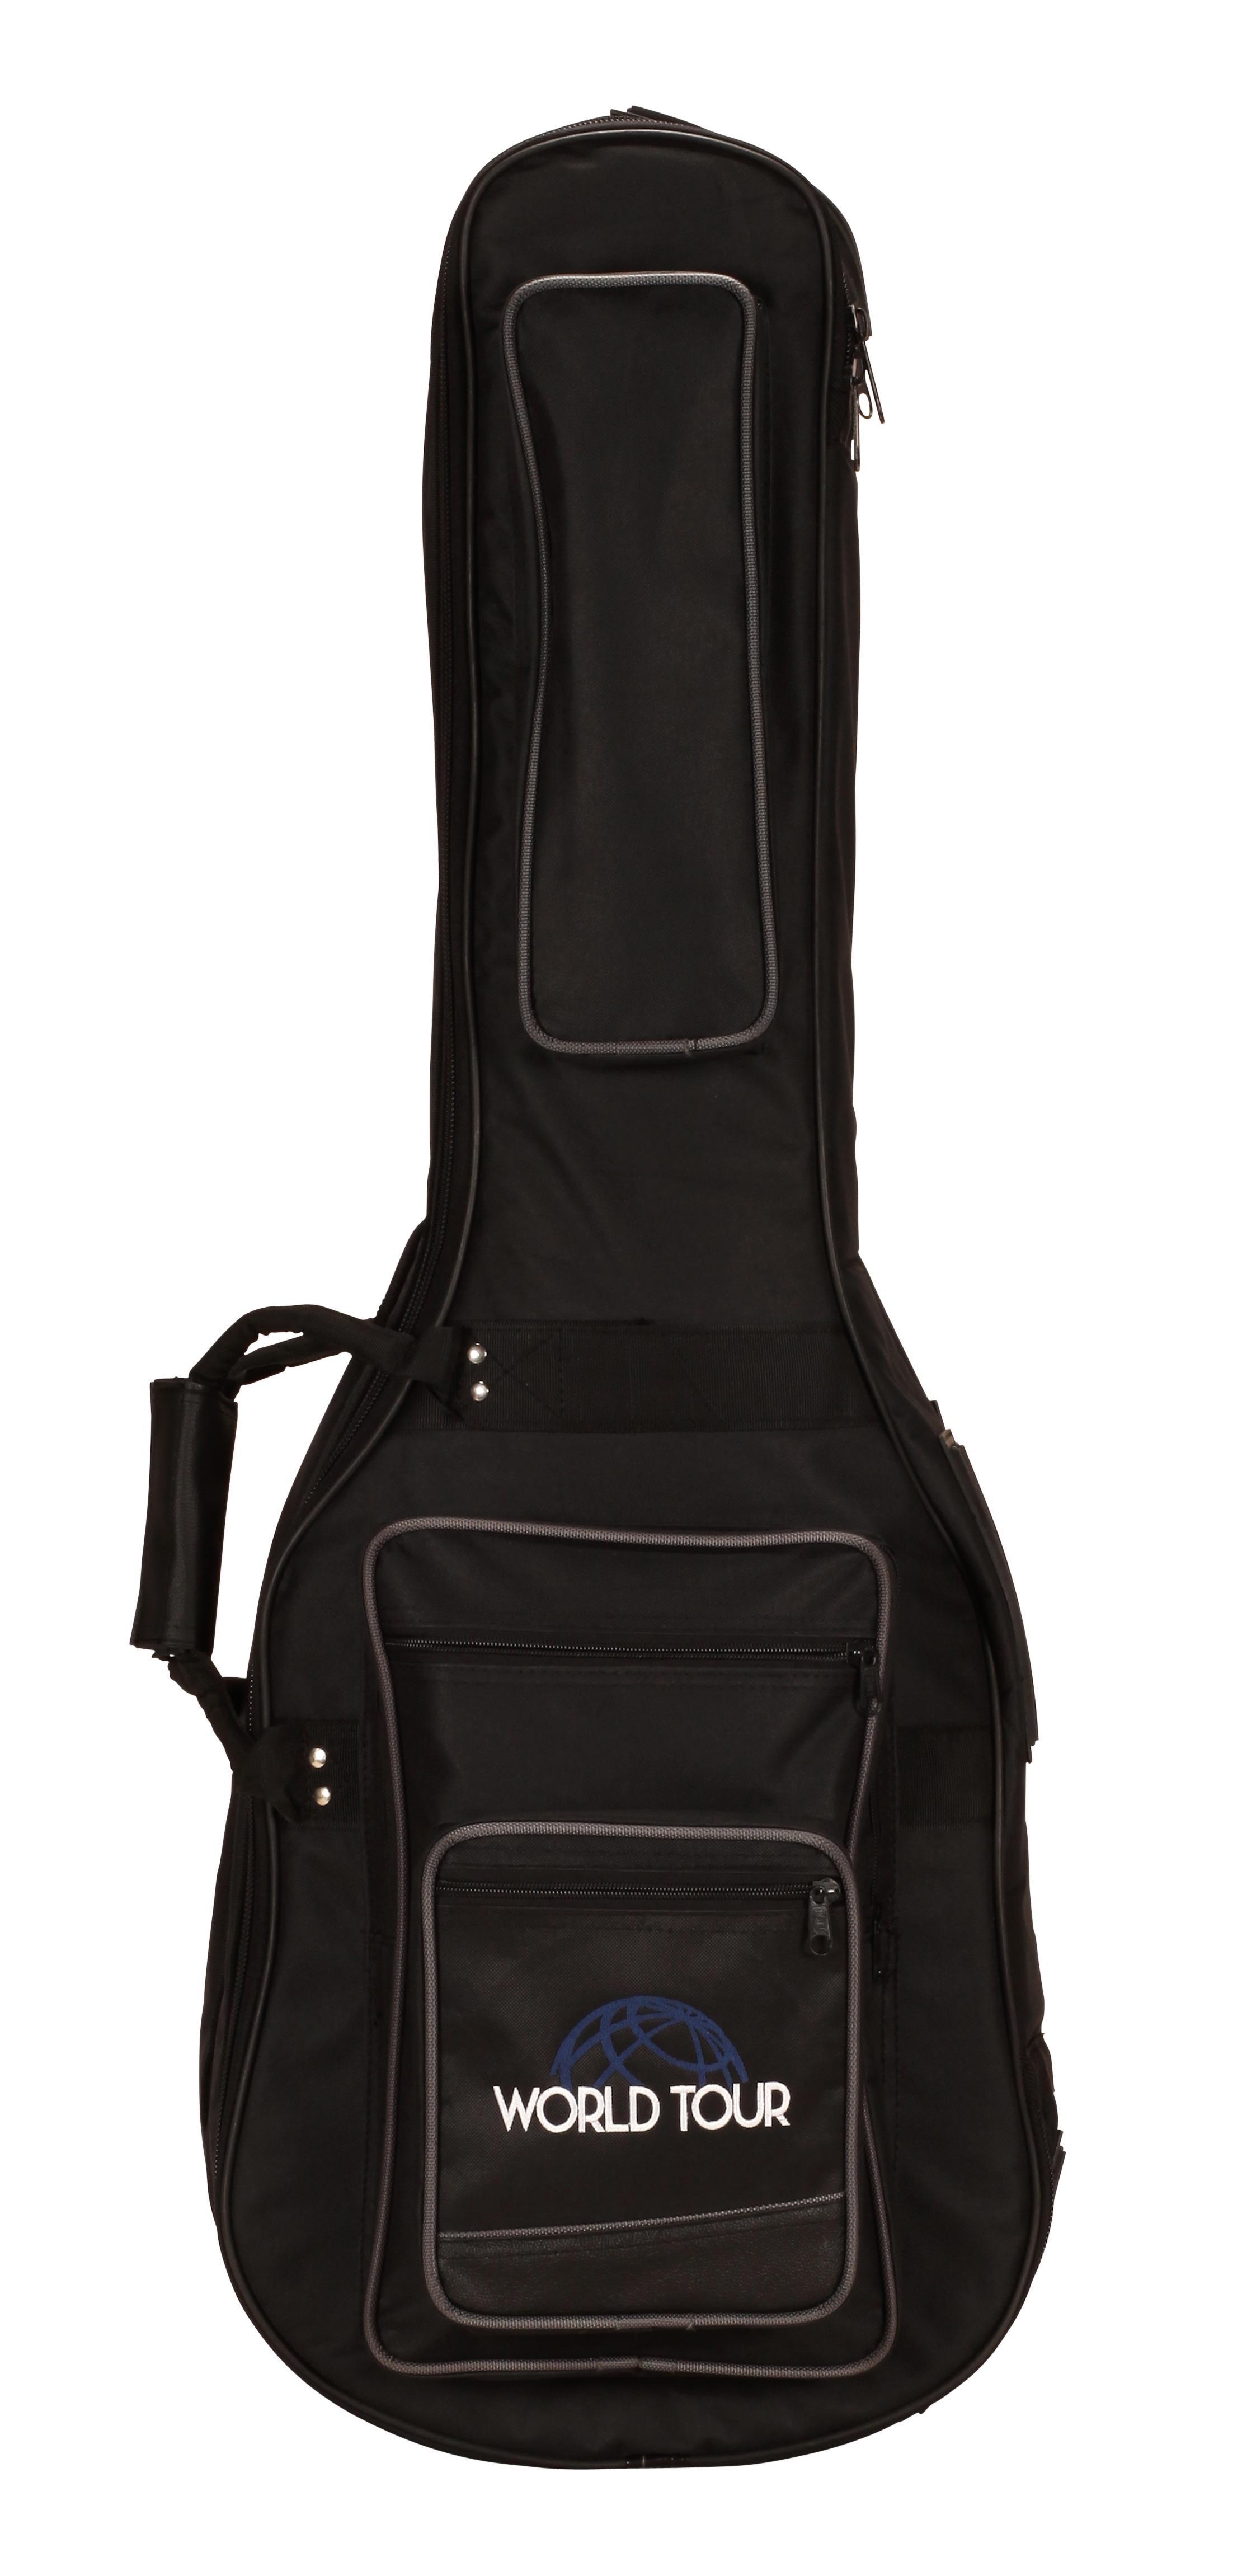 world tour pro double electric guitar gig bag musical instruments. Black Bedroom Furniture Sets. Home Design Ideas